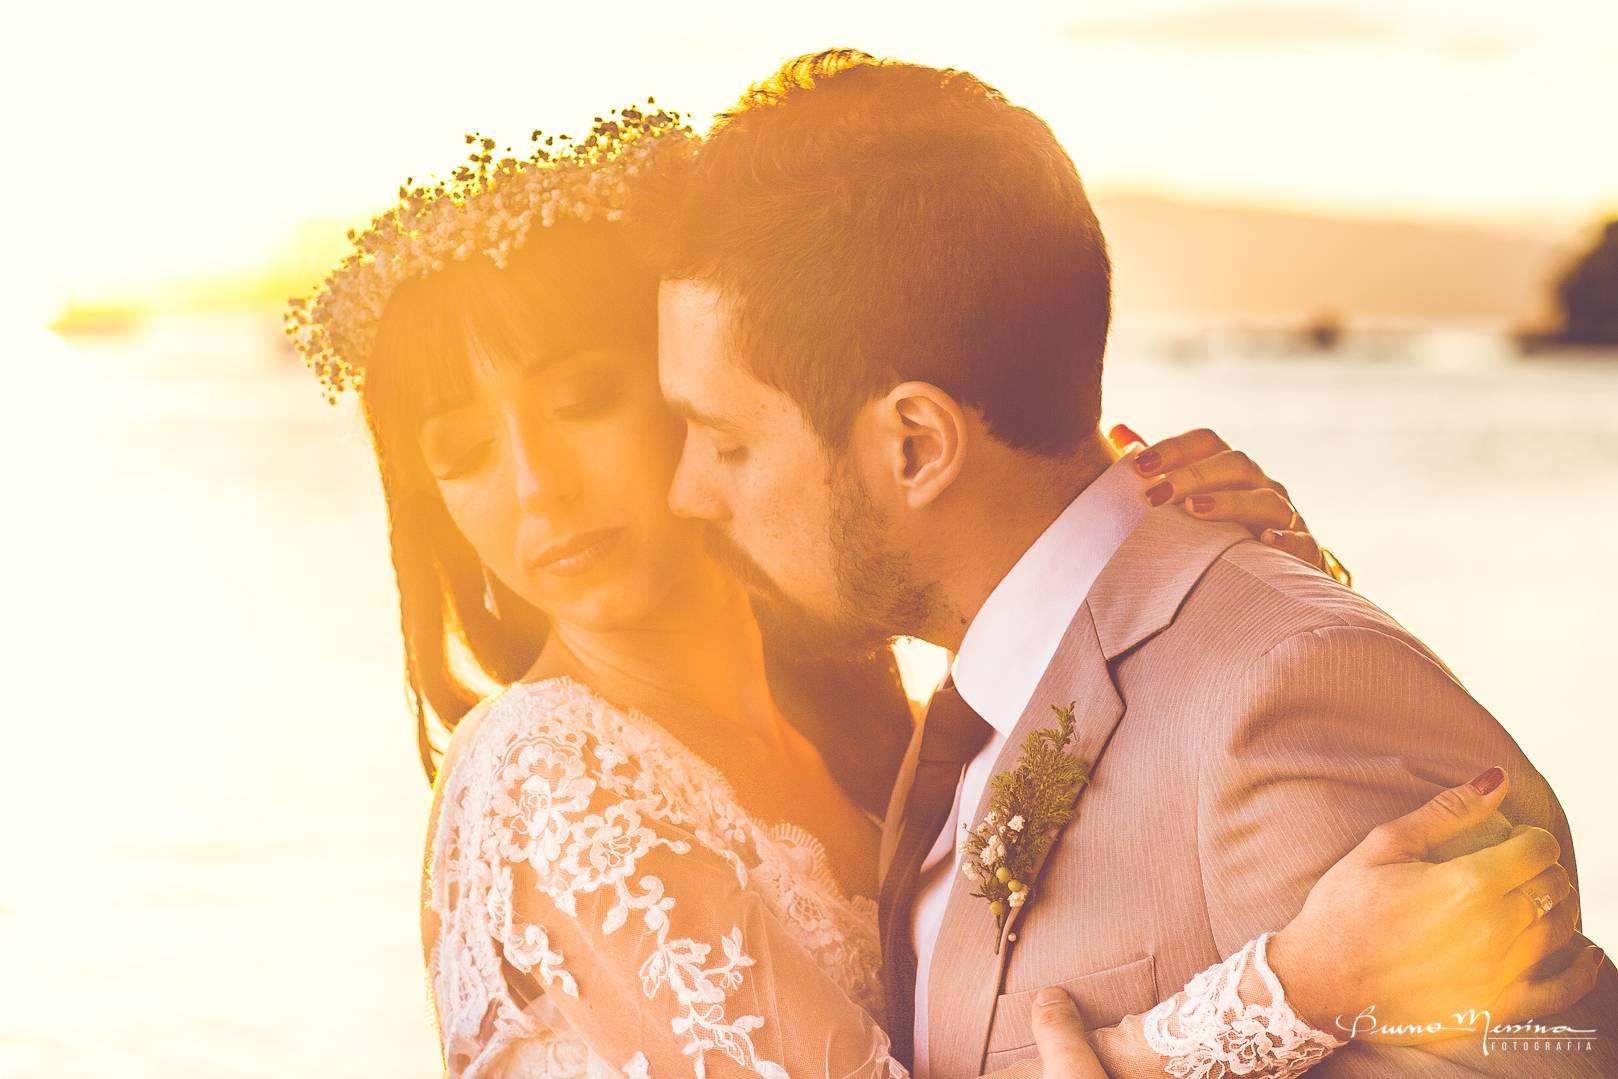 casamento-ao-ar-livre-casamento-na-praia-fotos-casamento-de-dia6